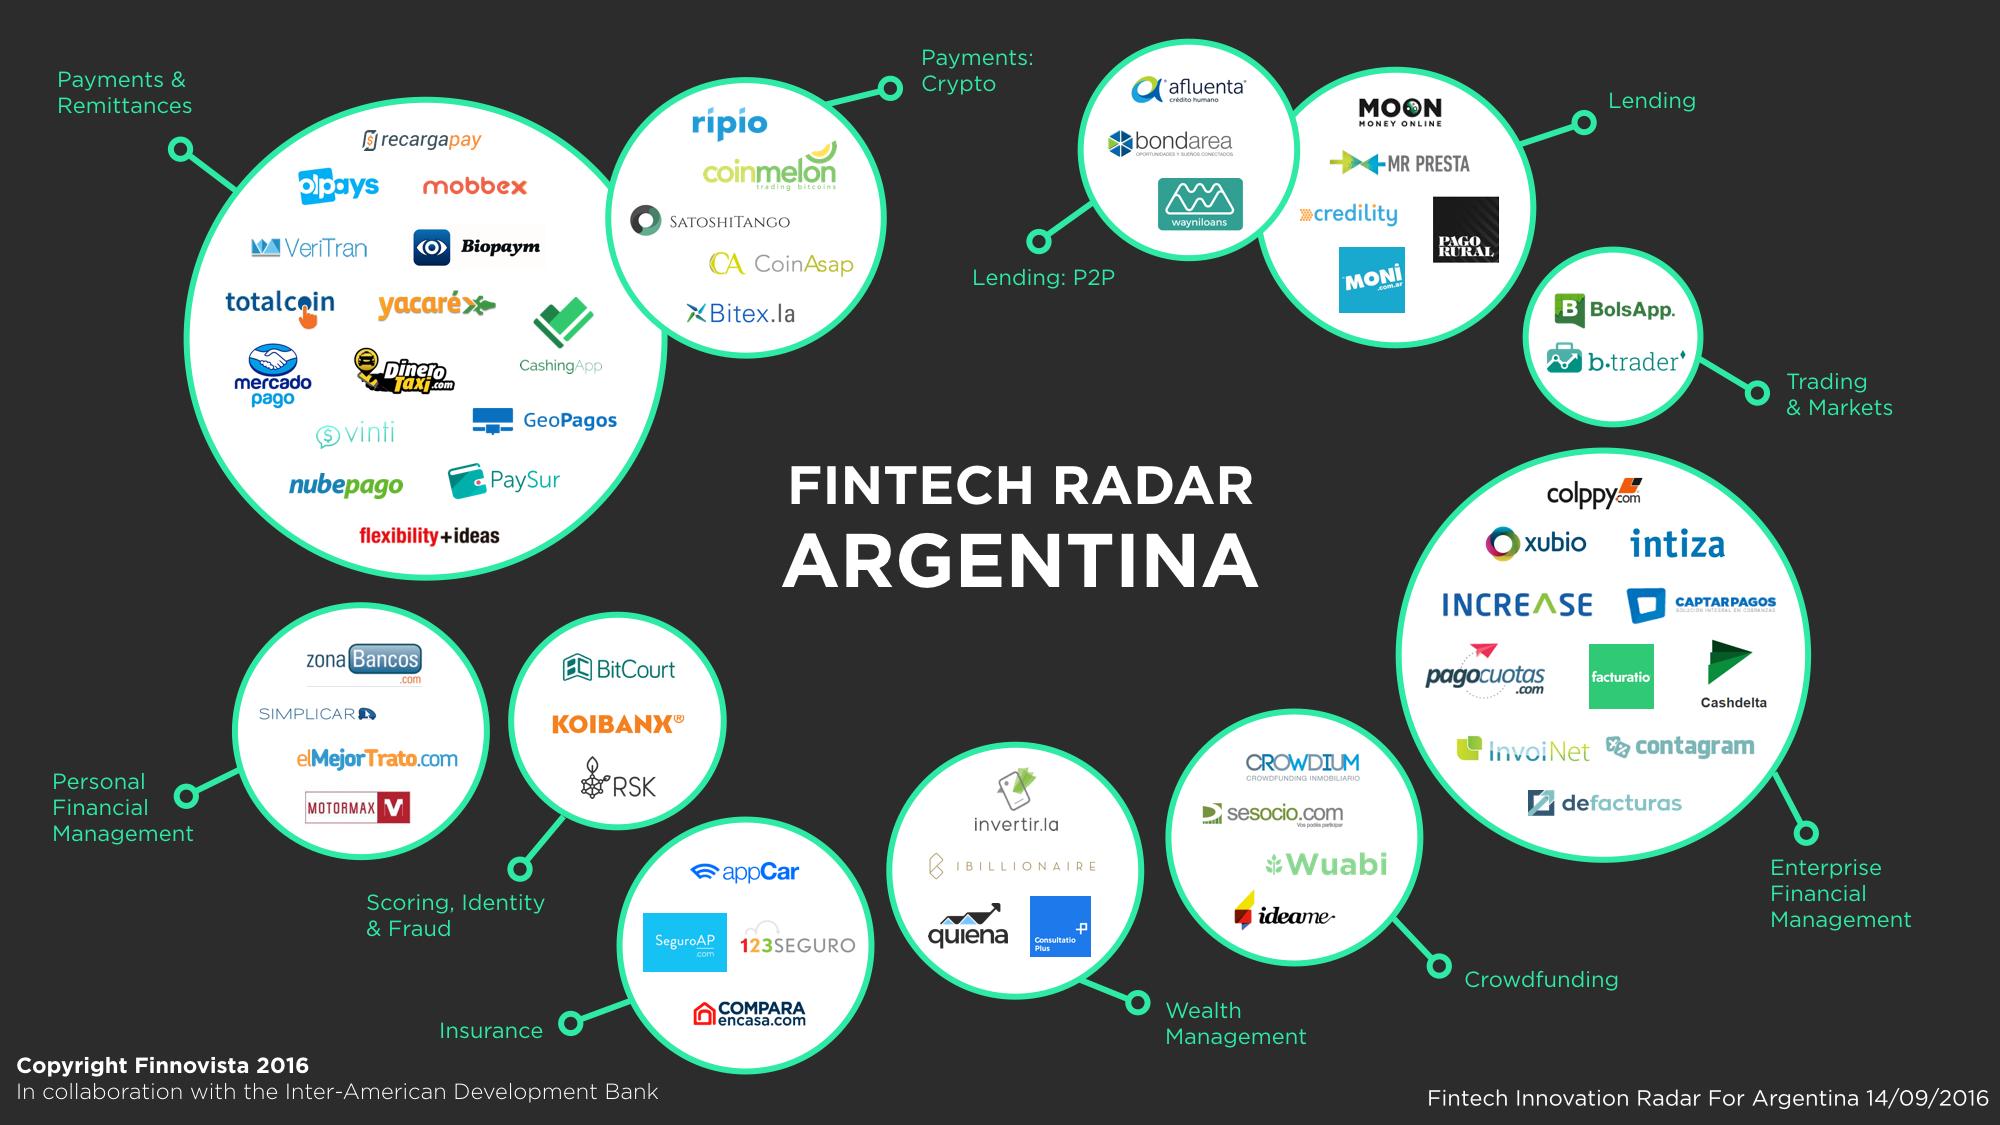 SeSocio.com entre las 60 startups a la vanguardia del sector Fintech argentino